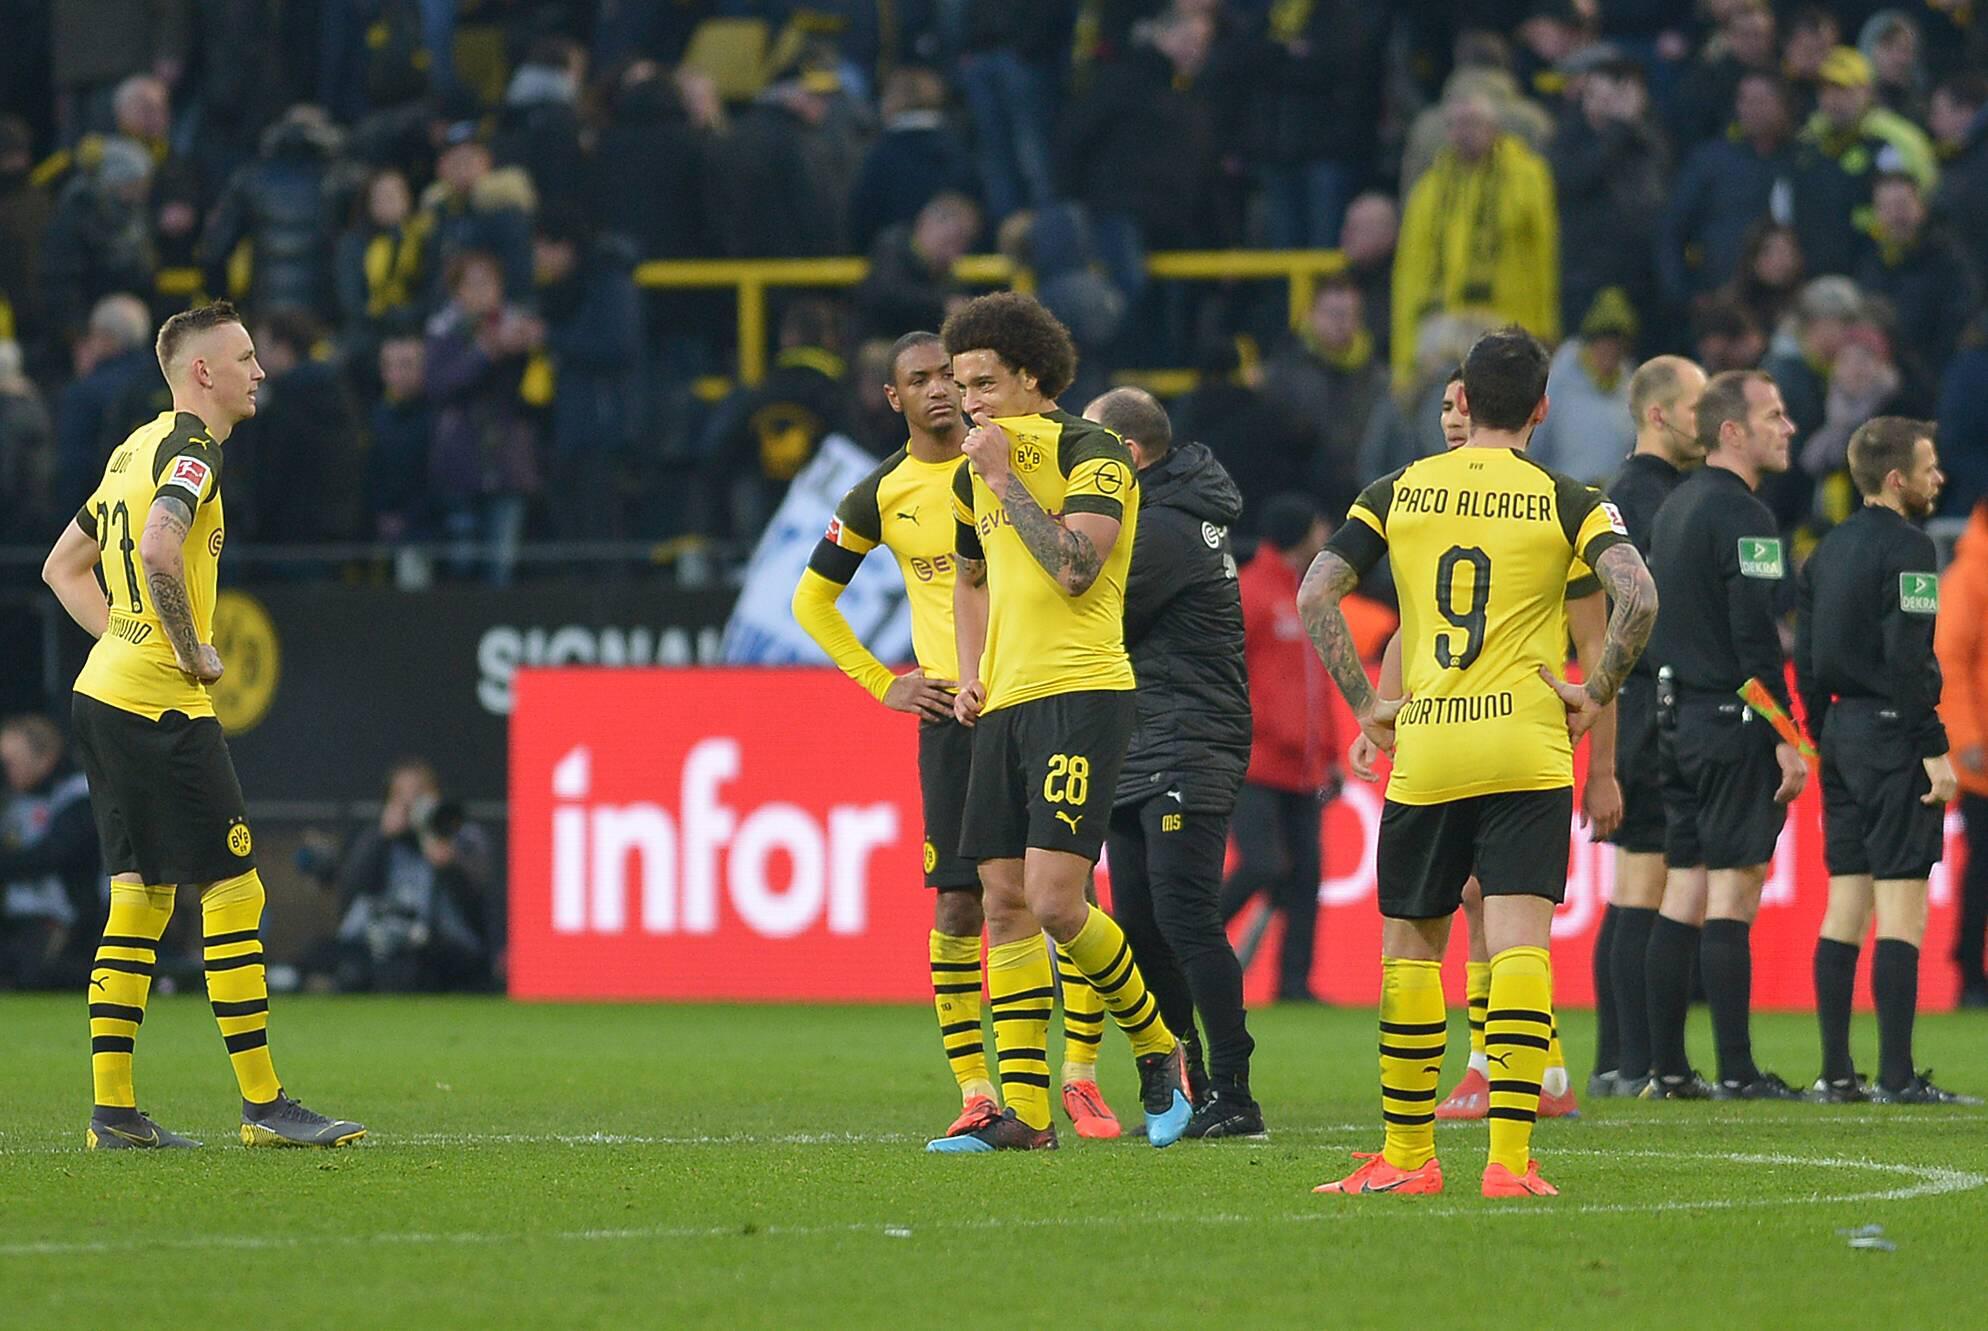 Bild zu Fußball, Bundesliga, BVB, Dortmund, Borussia, Hoffenheim